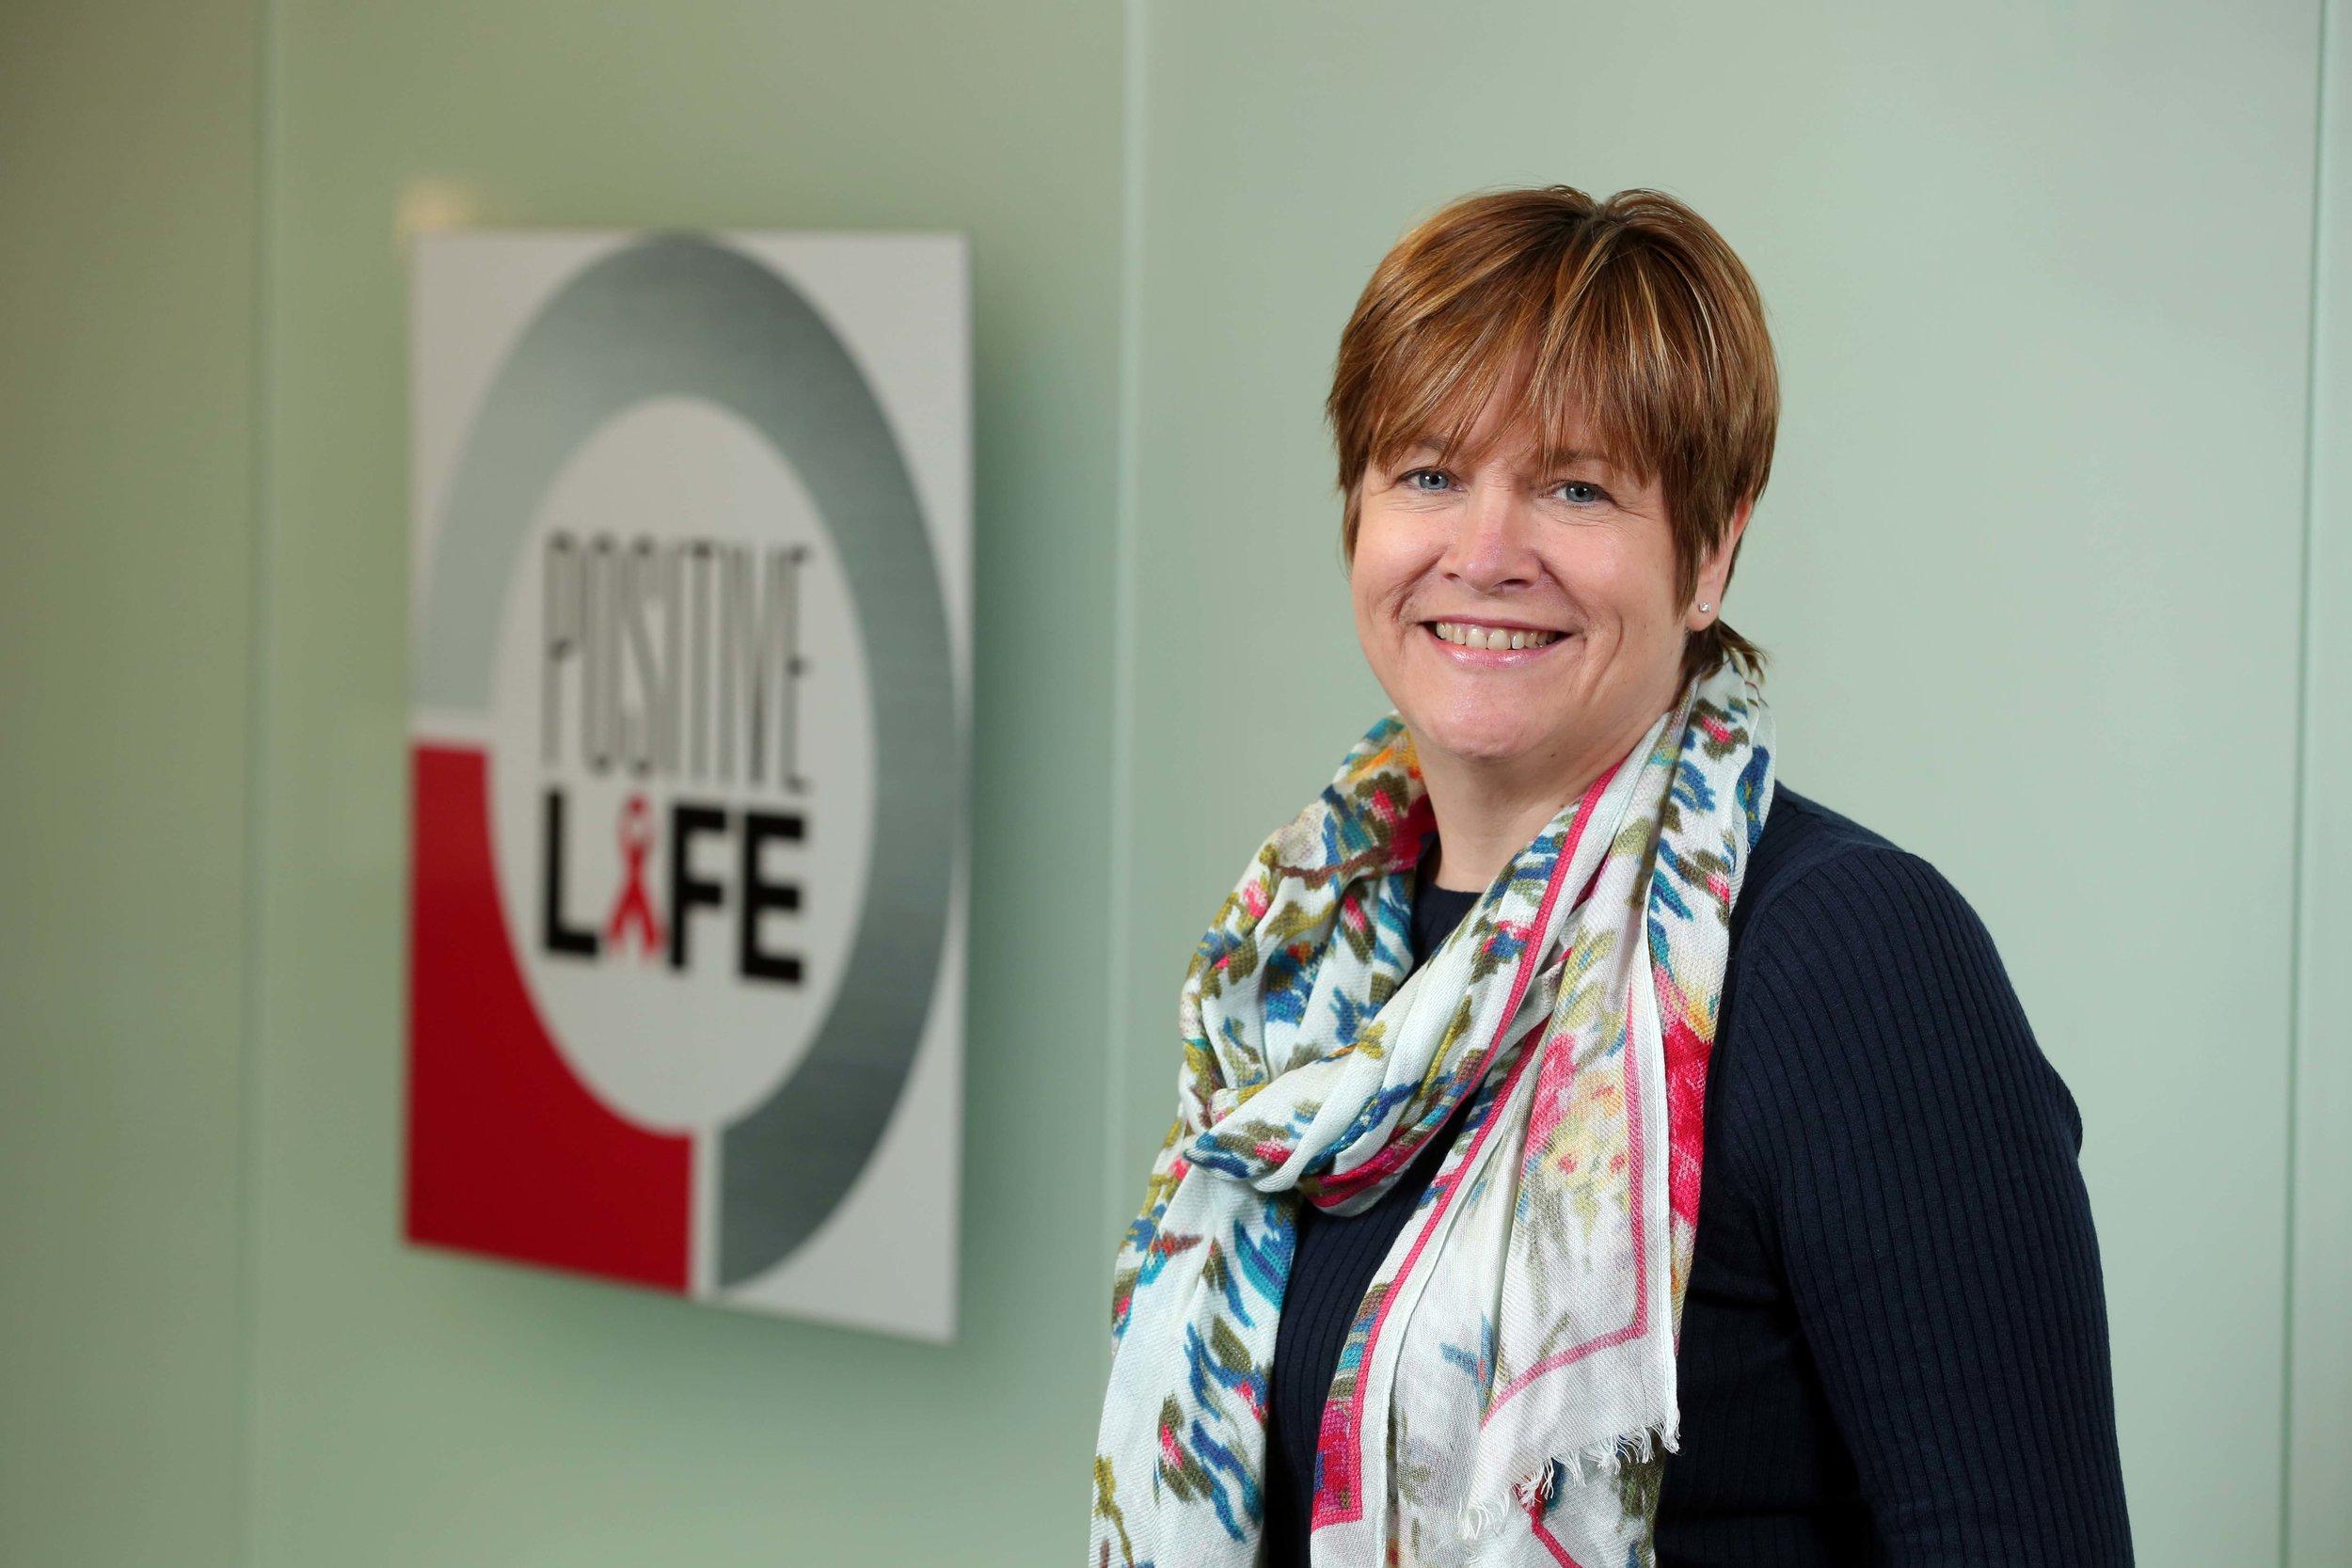 Jacquie Richardson, Chief Executive, Positive Life